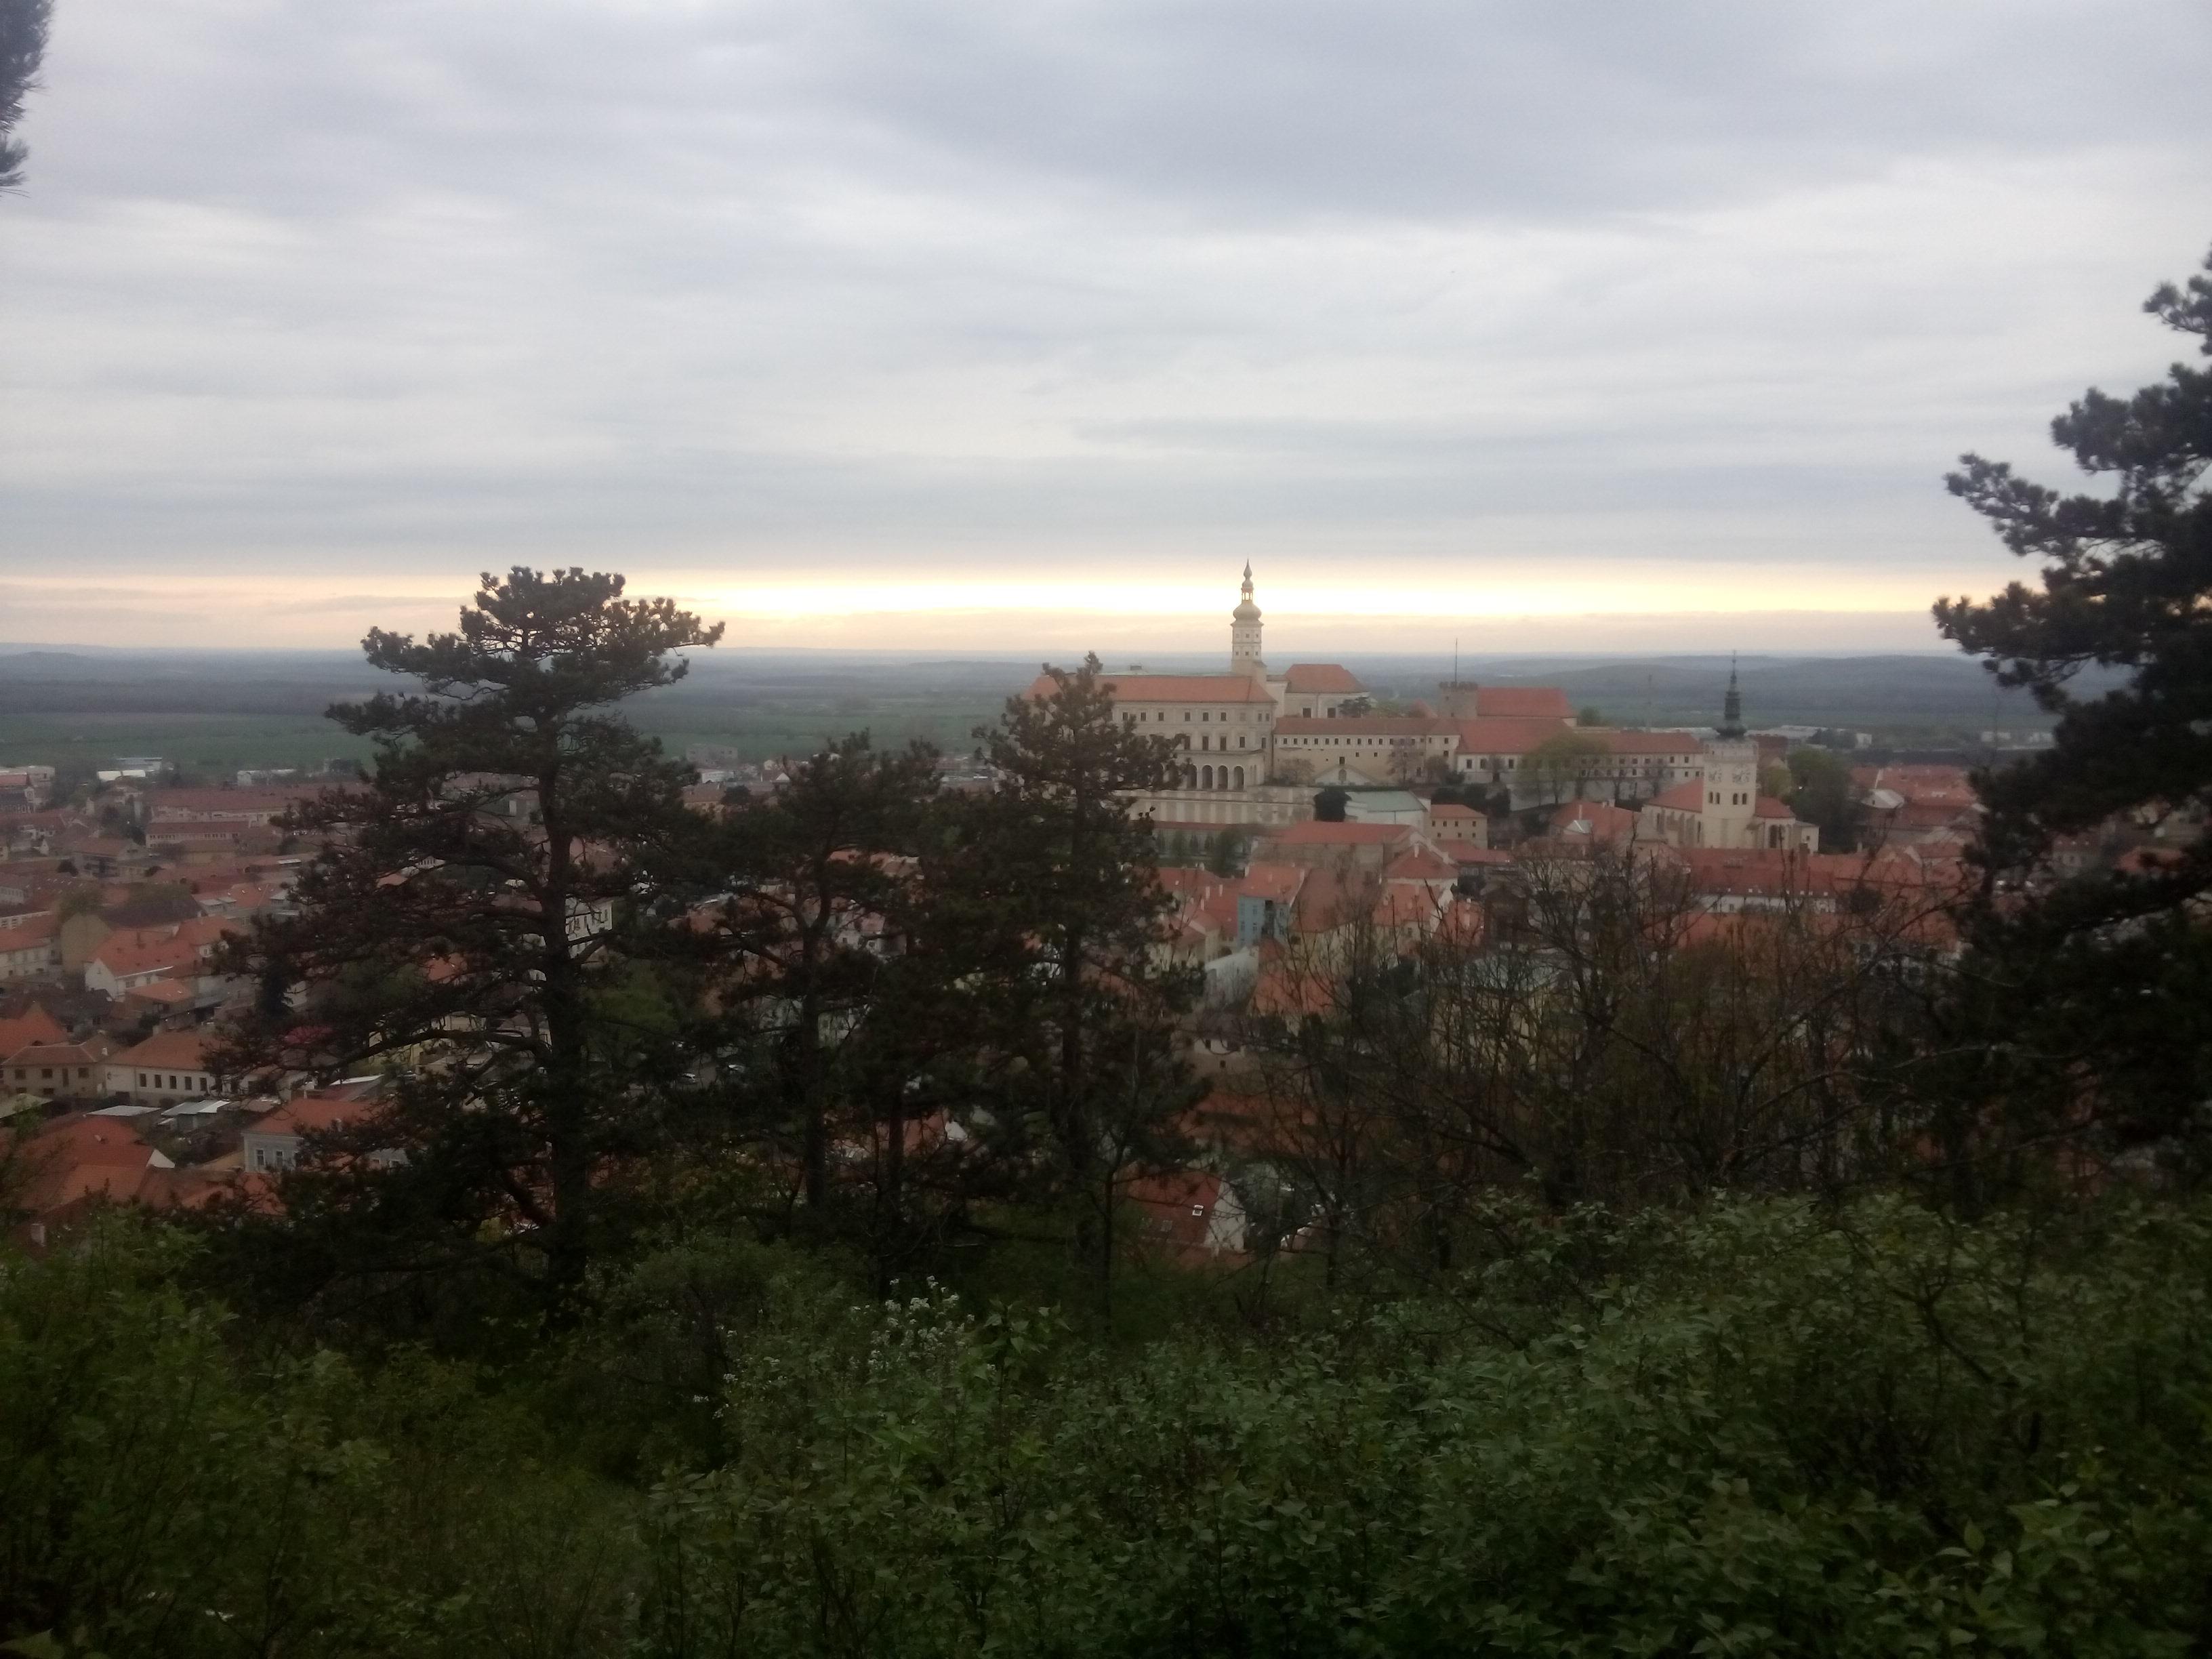 https://i.amy.gy/201804-slovakia-austria-czech/IMG_20180416_184226.jpg